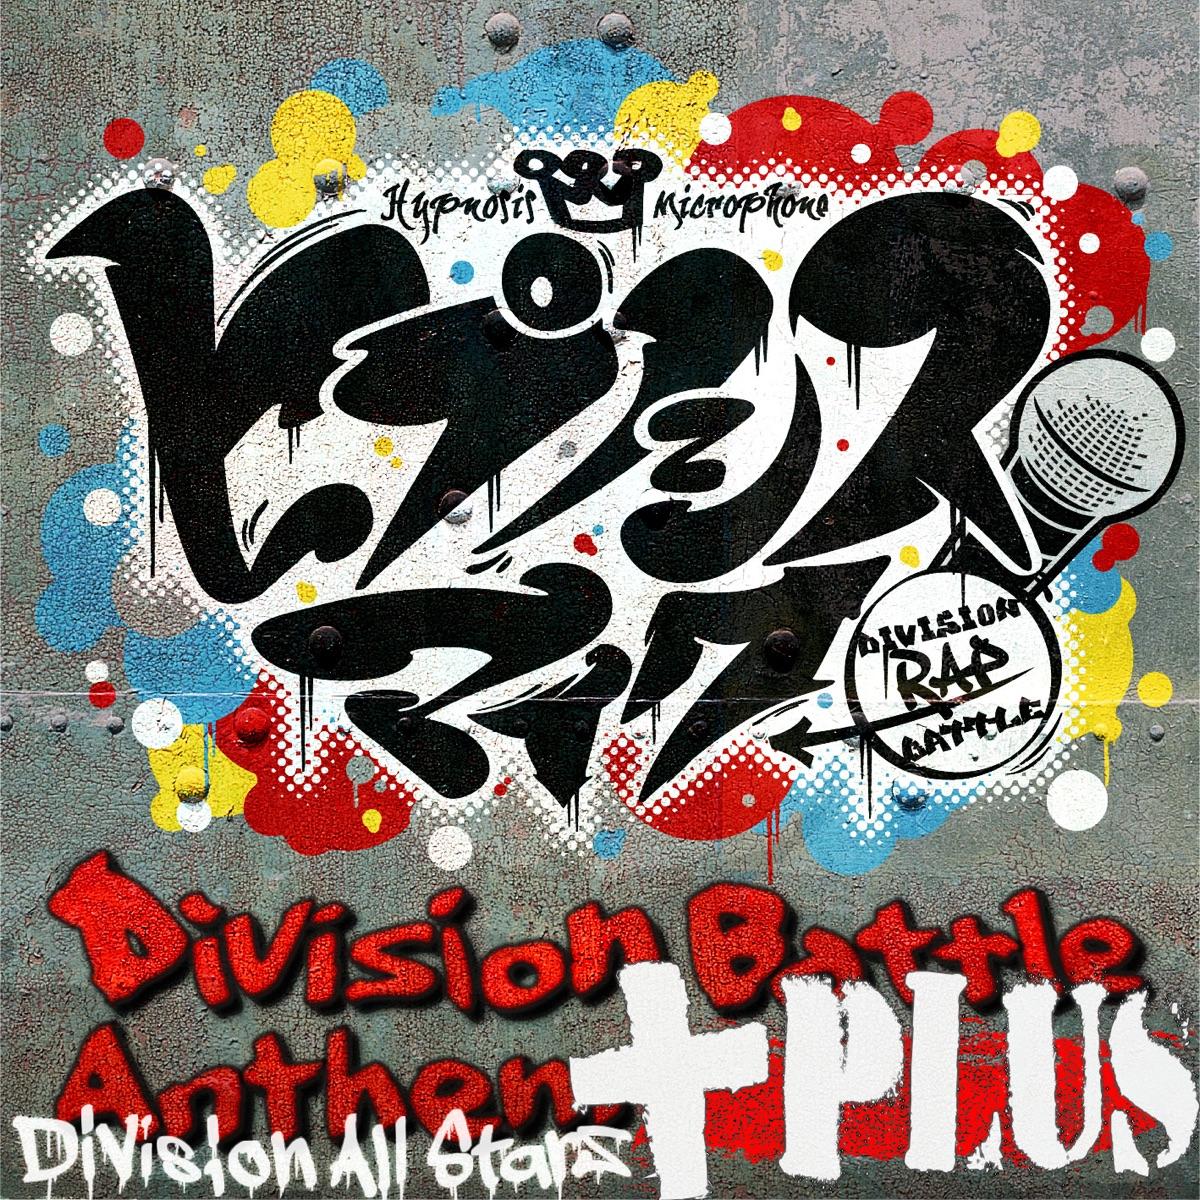 『Division All Stars - ヒプノシスマイク -Division Battle Anthem-+』収録の『ヒプノシスマイク -Division Battle Anthem-+』ジャケット